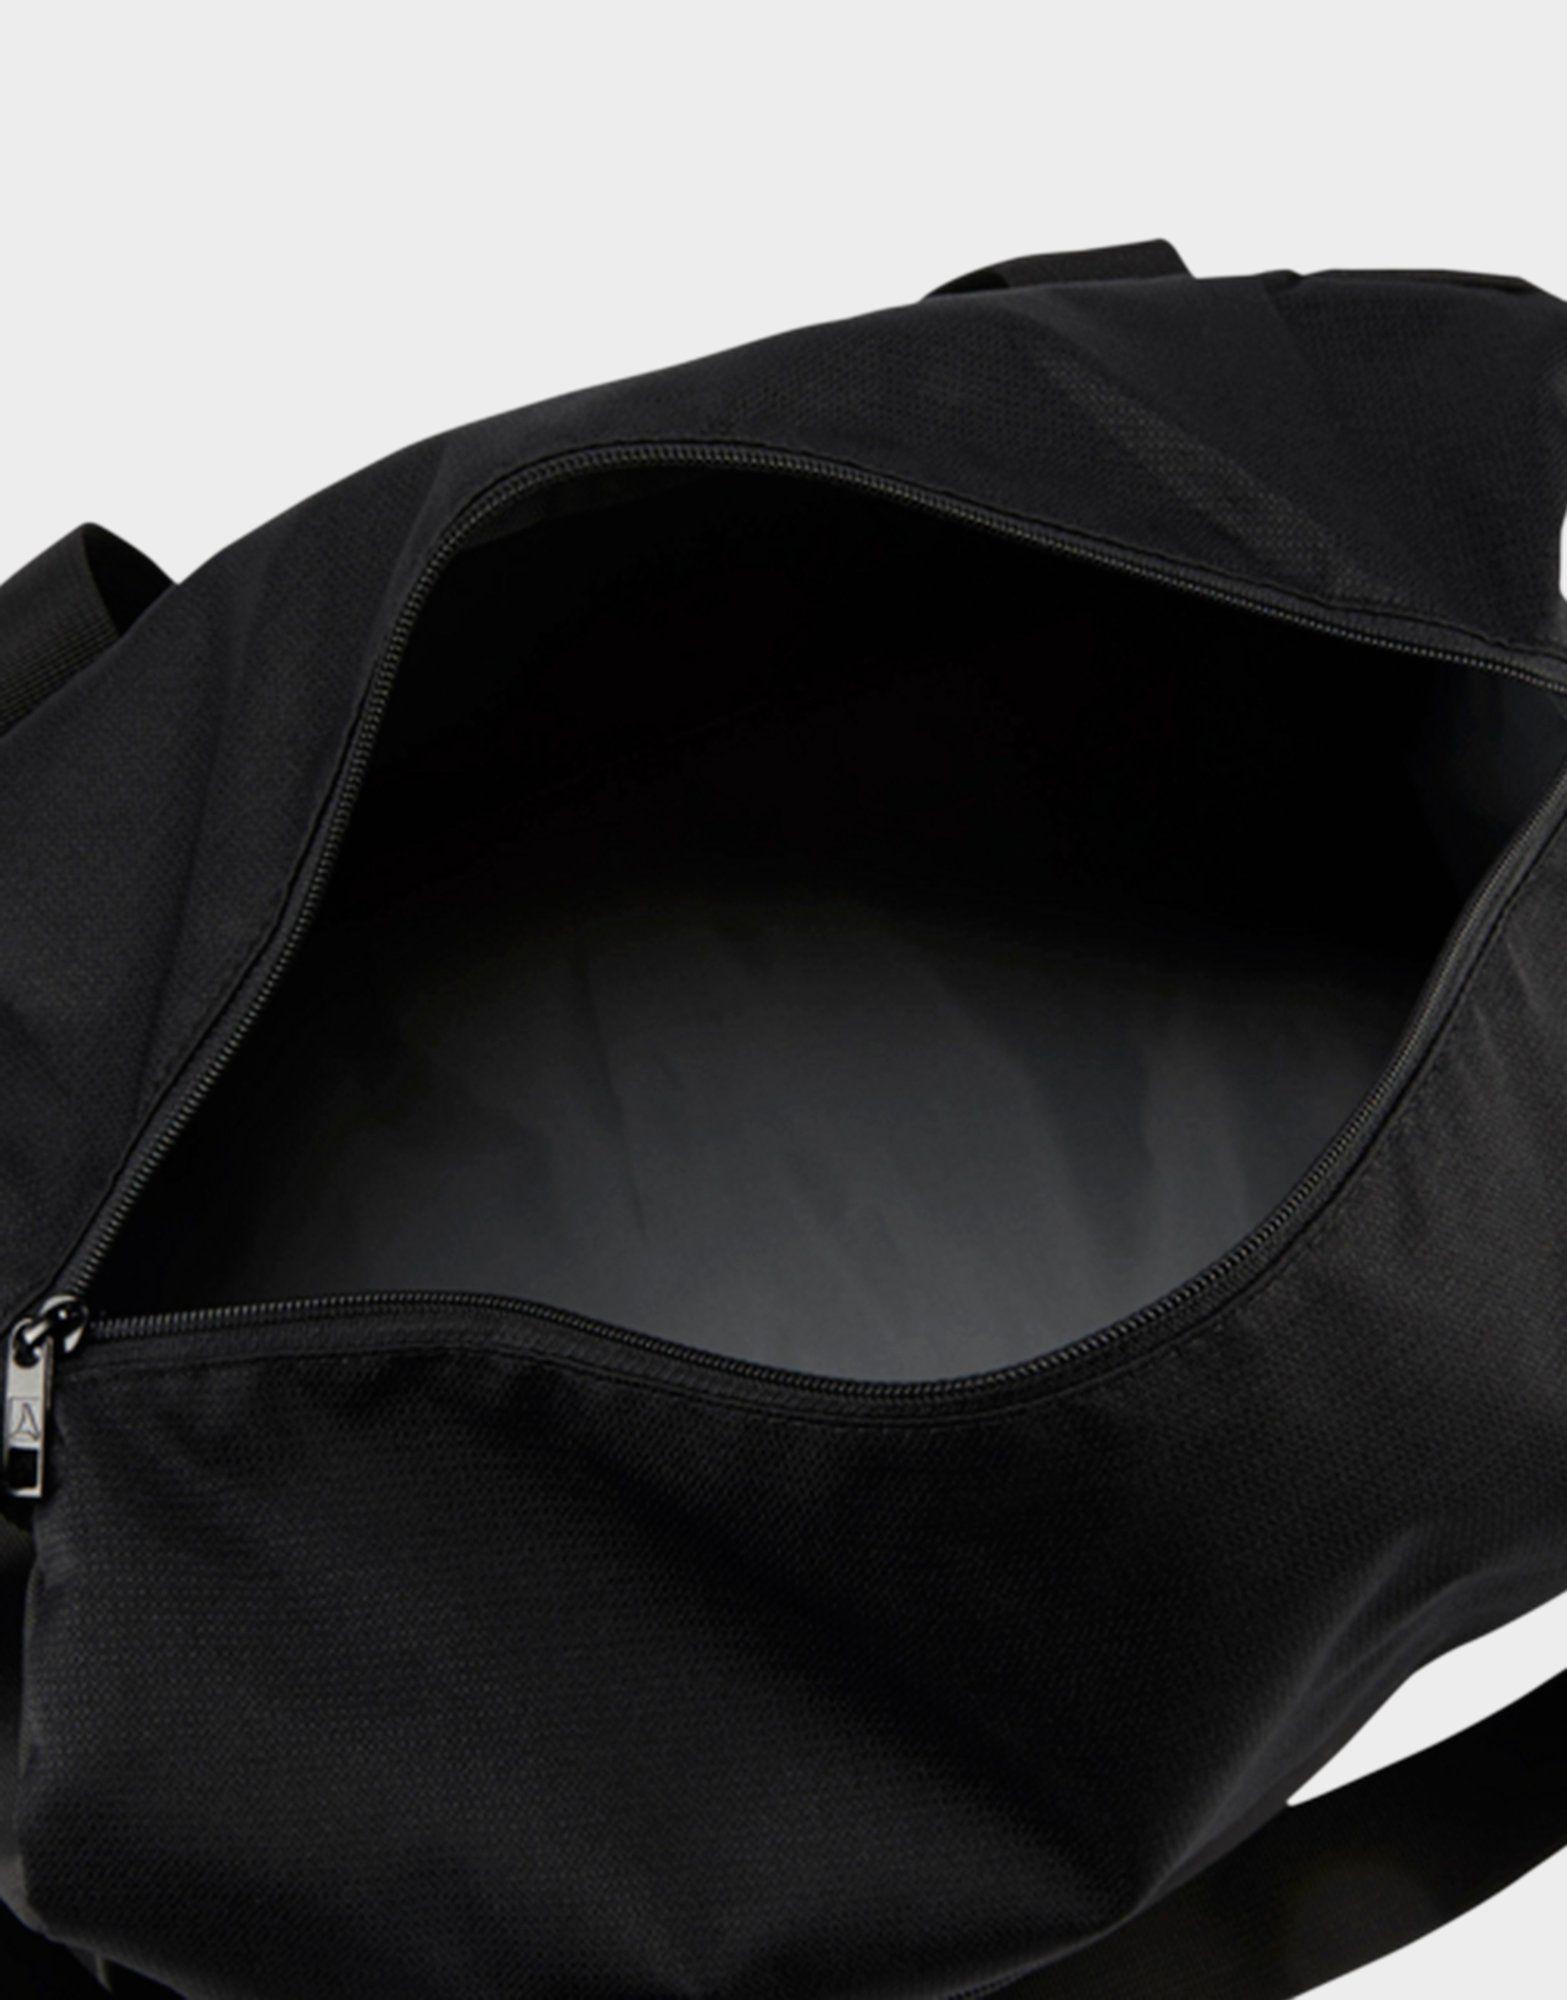 REEBOK Active Foundation Grip Duffel Bag Small